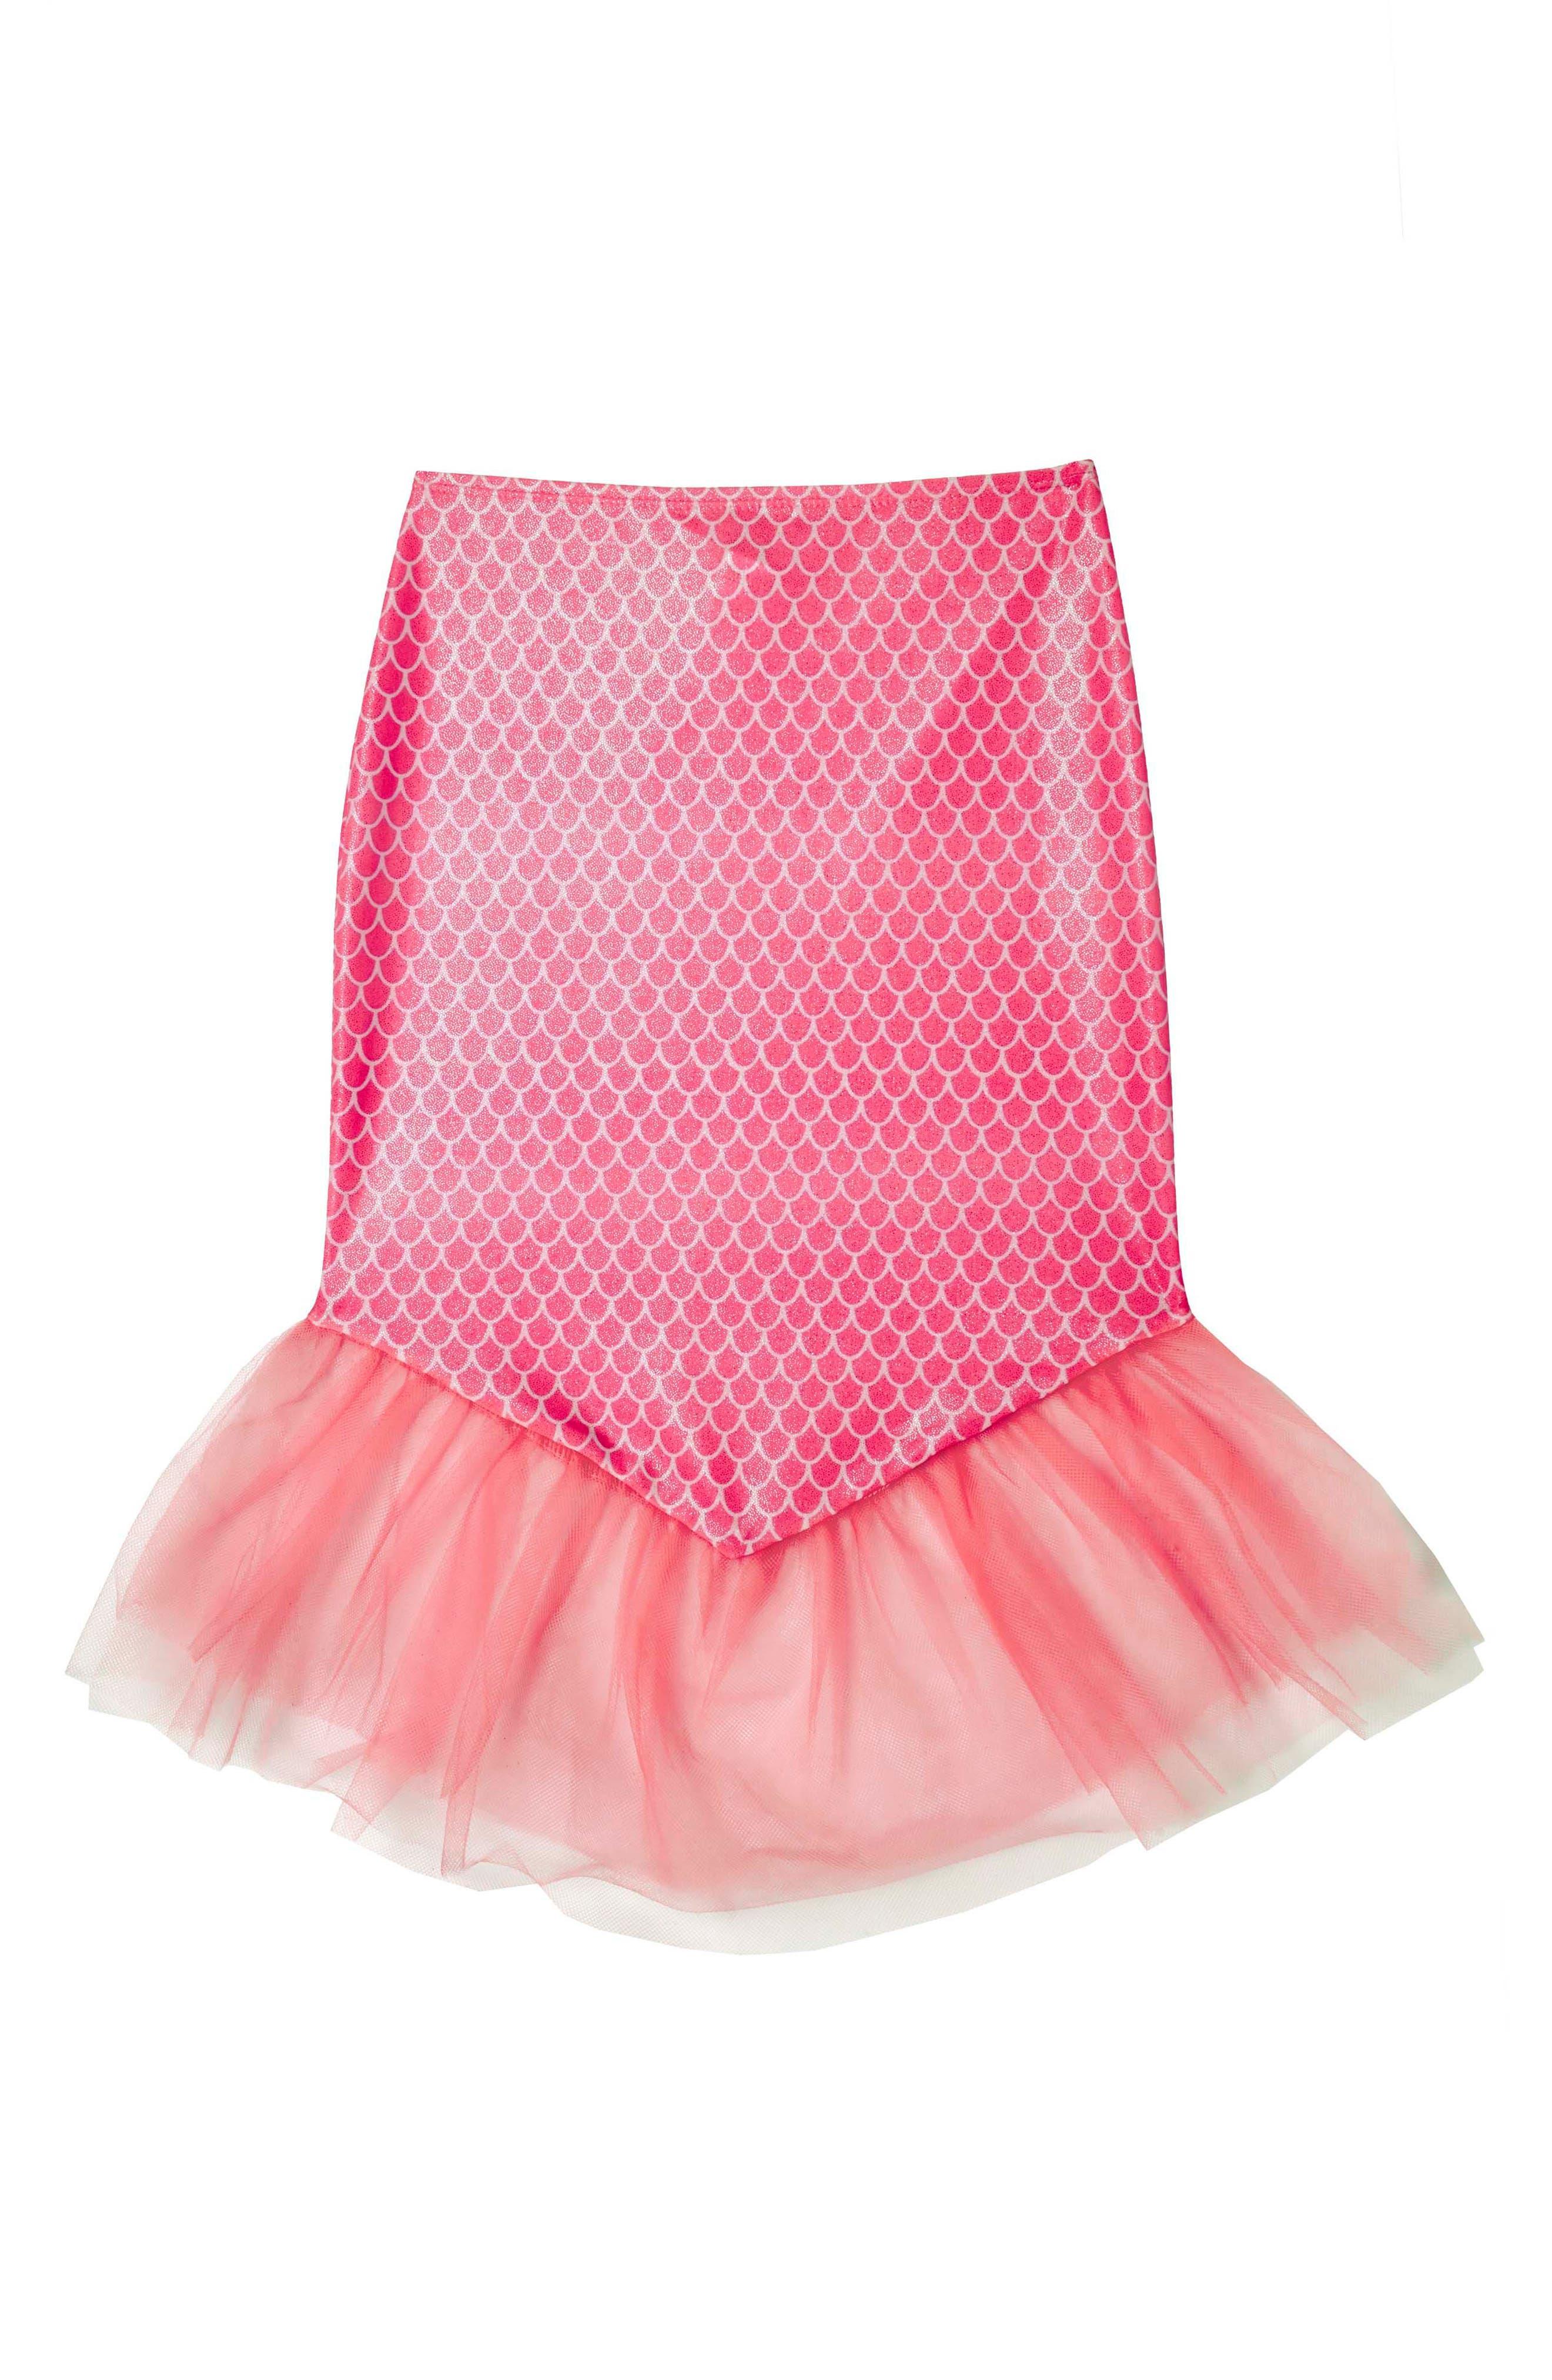 Hula Star Mermaid Princess Cover-Up Skirt (Toddler Girls & Little Girls)